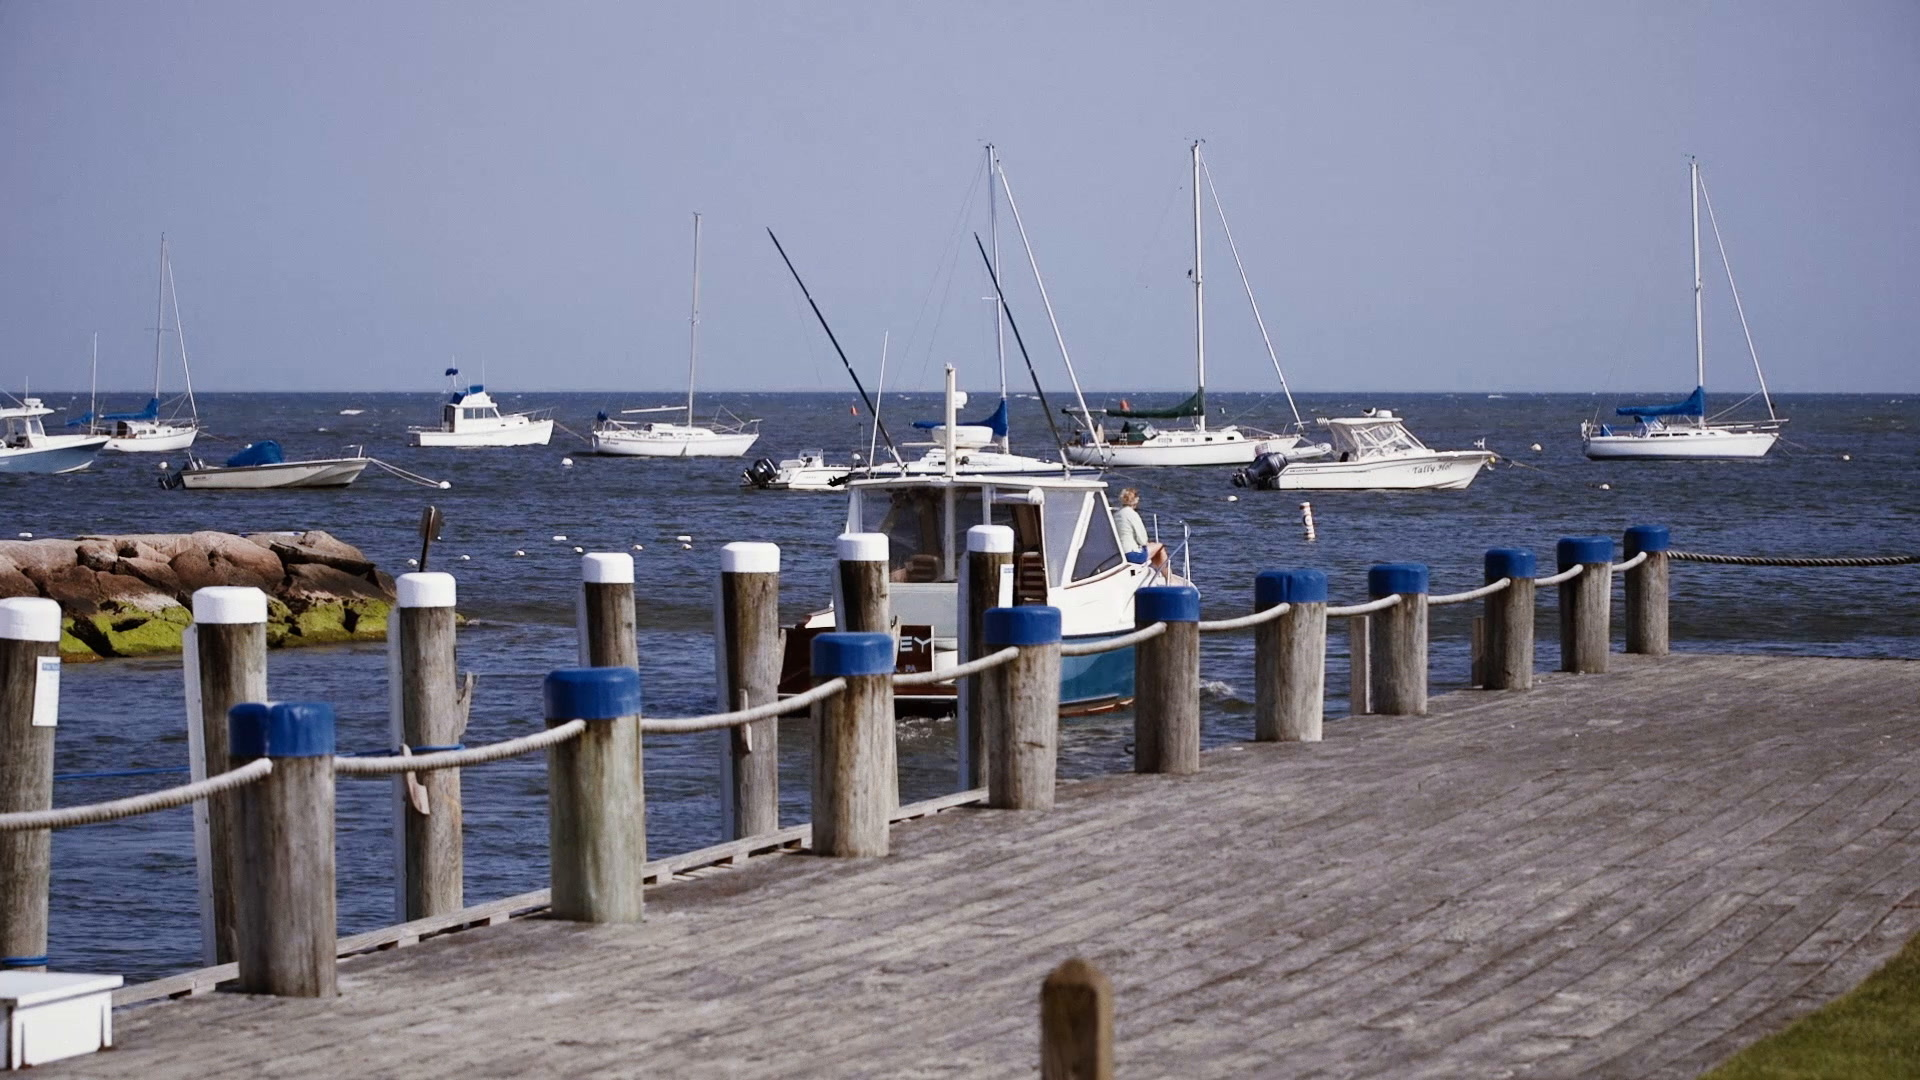 Nina + Ben | Barnstable County, Massachusetts | Wychmere Beach Club